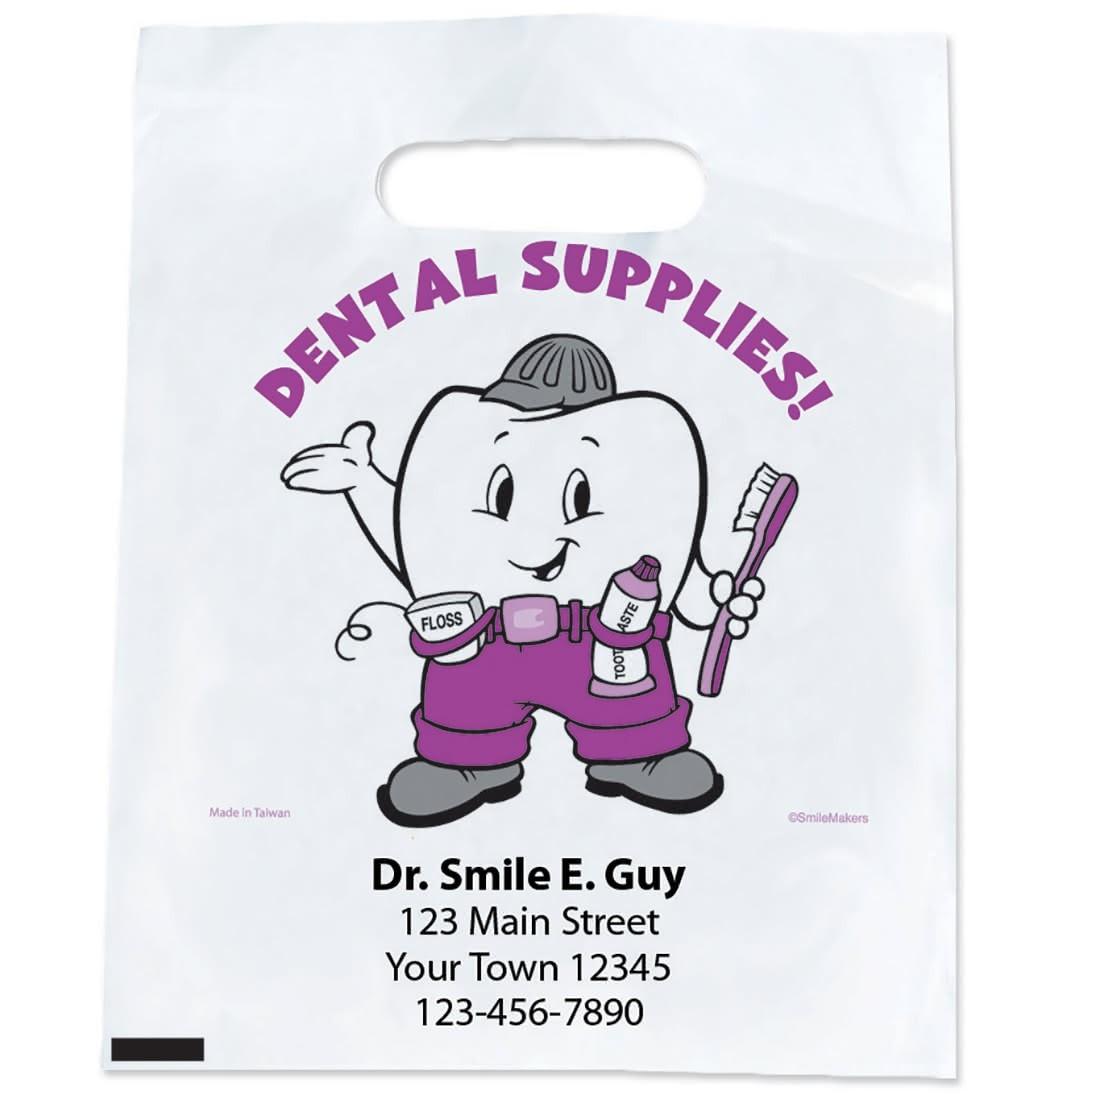 Custom Dental Supplies Bags                        [image]